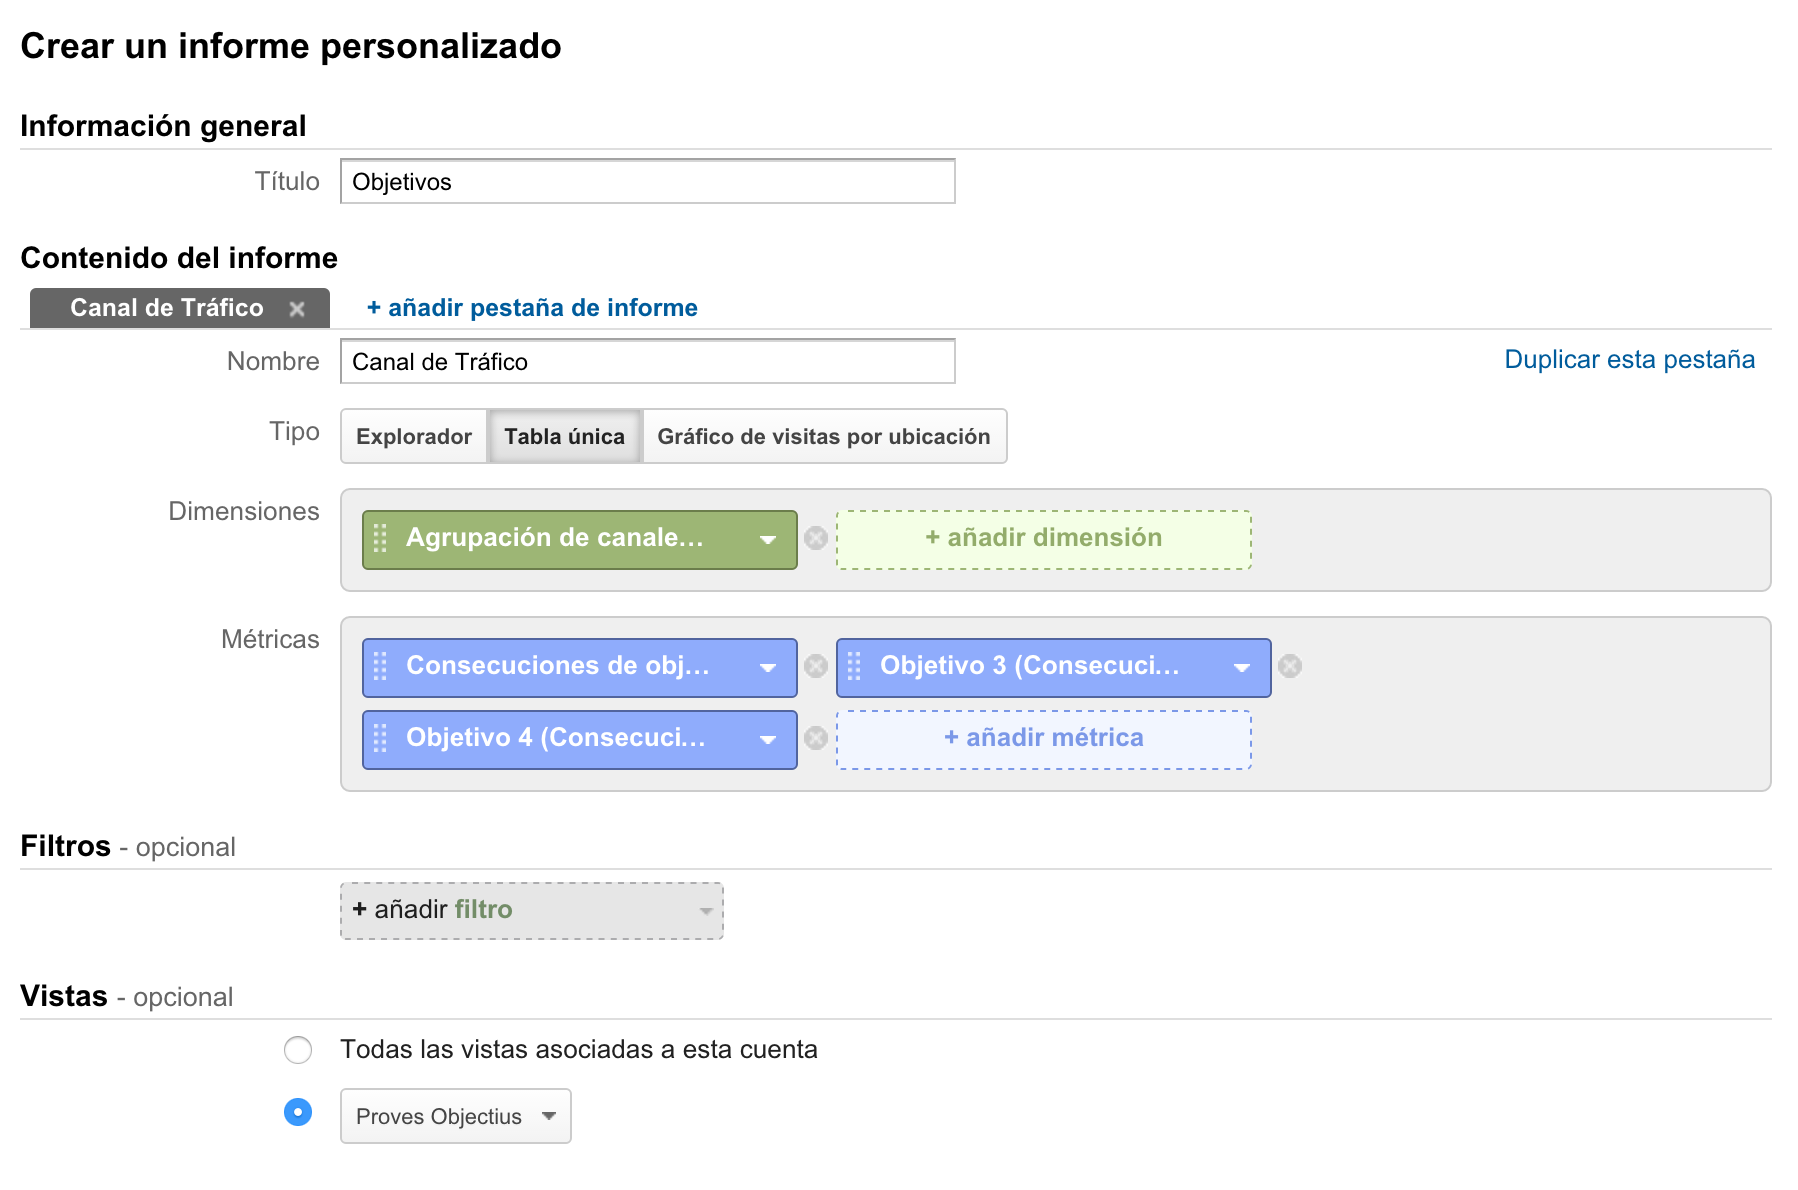 Informe_personalizado.png